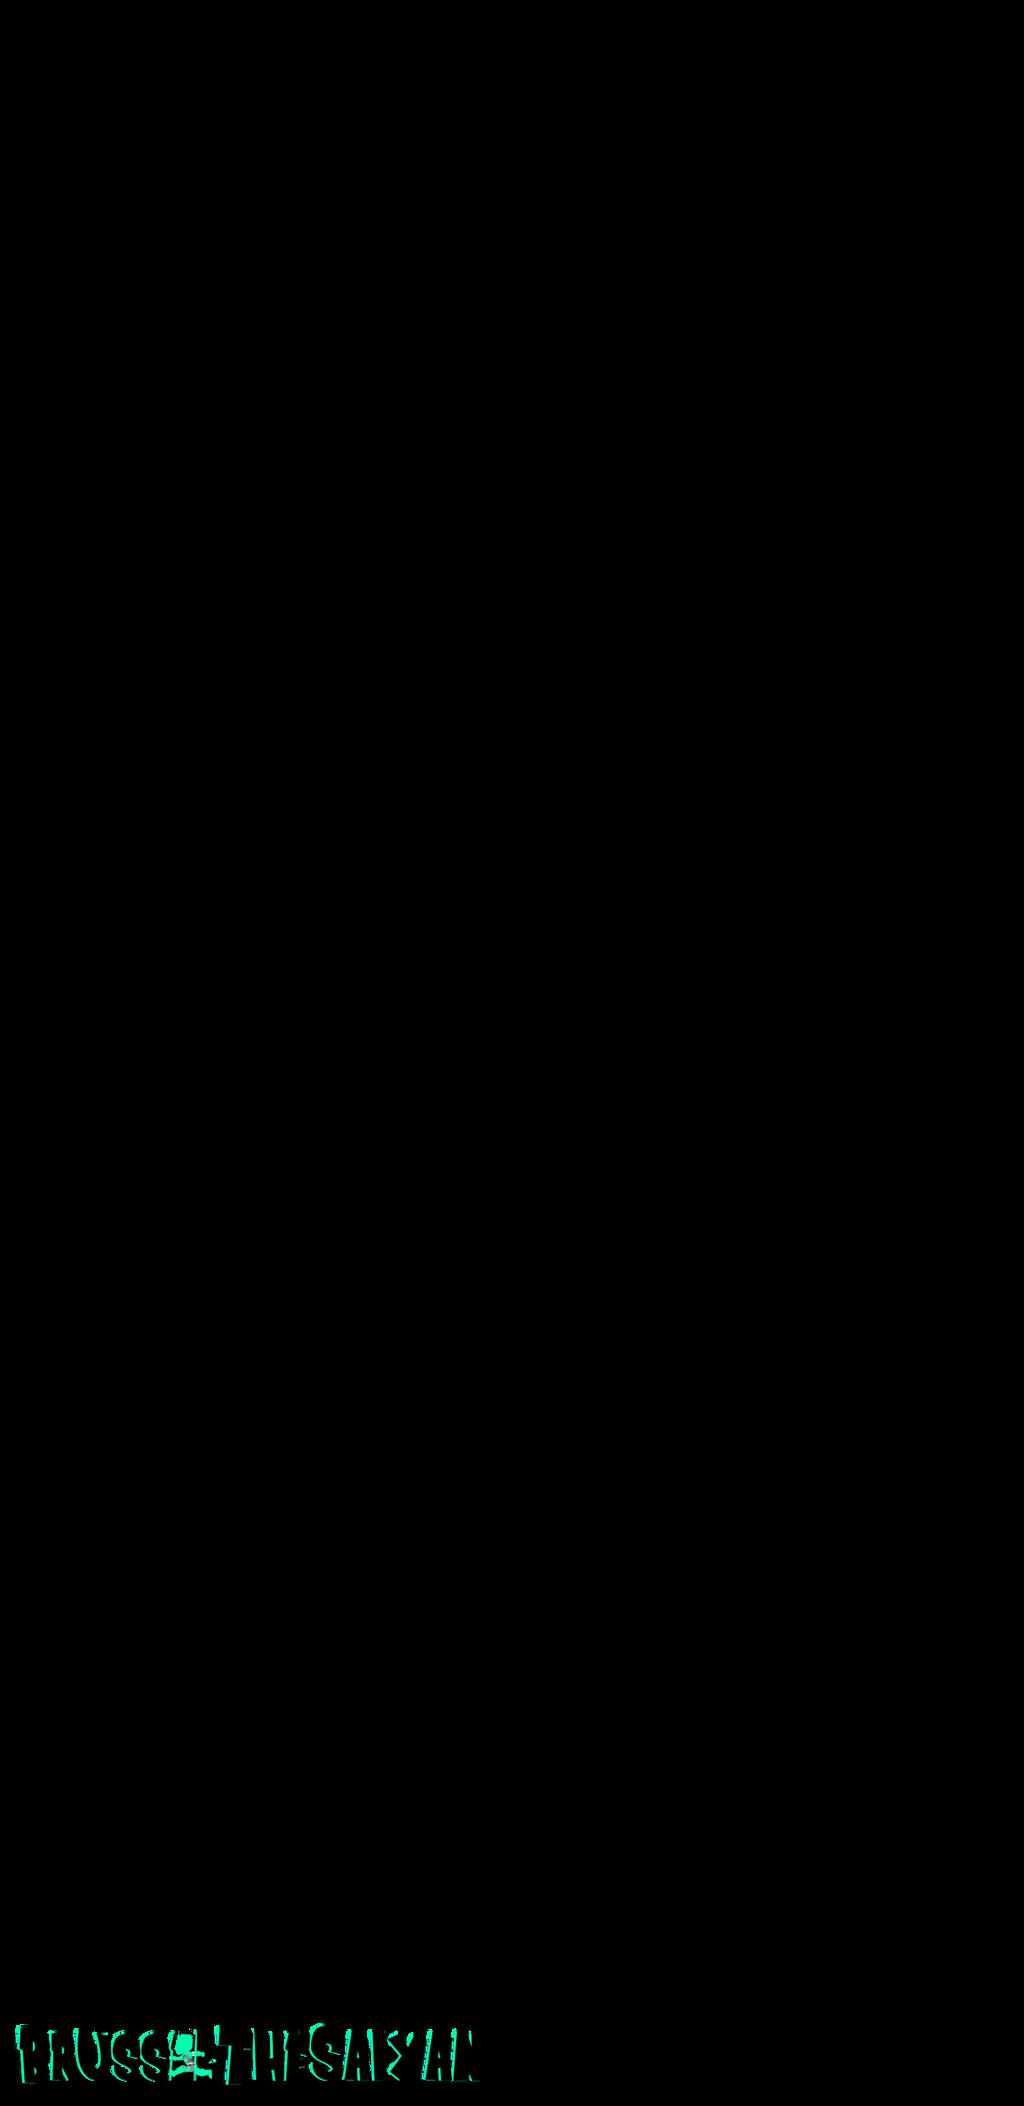 Black Goku 2 Lineart by BrusselTheSaiyan on DeviantArt